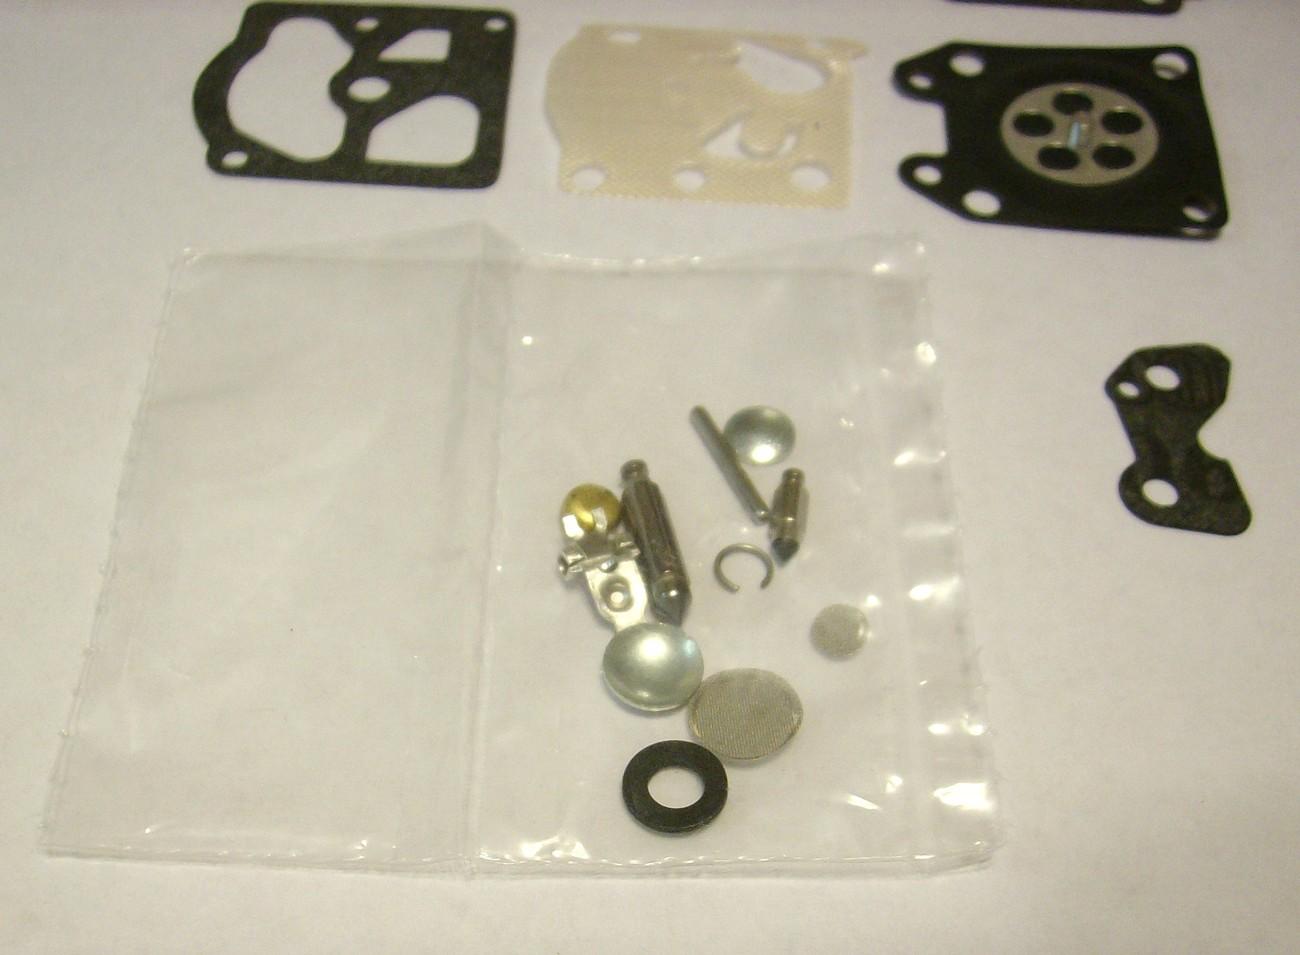 Walbro WA & WT carb carburetor rebuild kit and 14 similar items